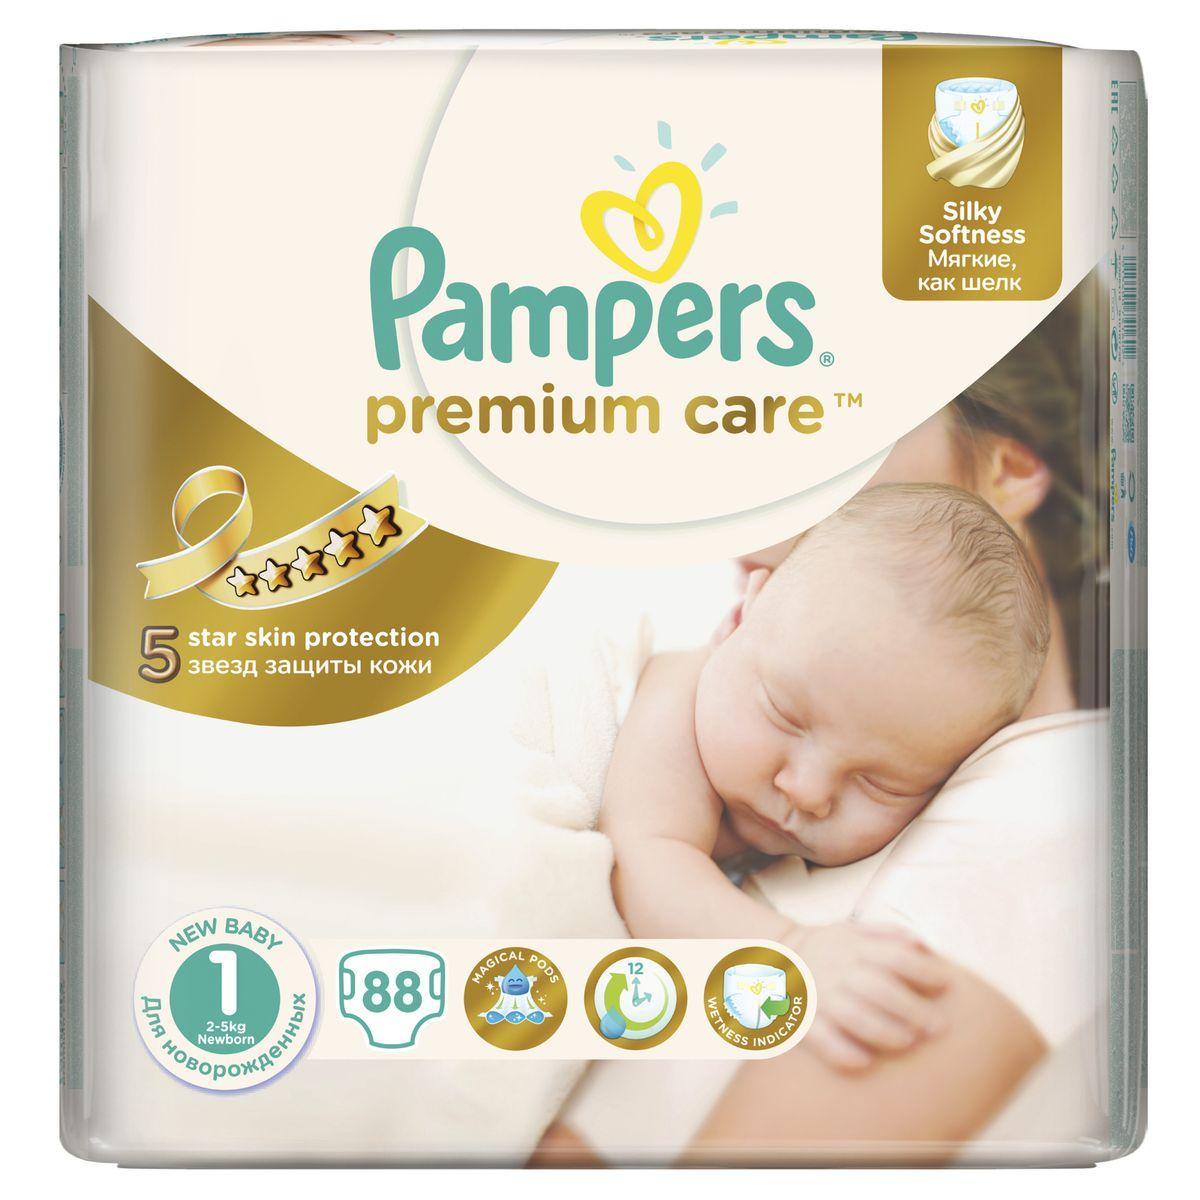 Pampers Подгузники Premium Care 2-5 кг размер 1 88 шт81532775